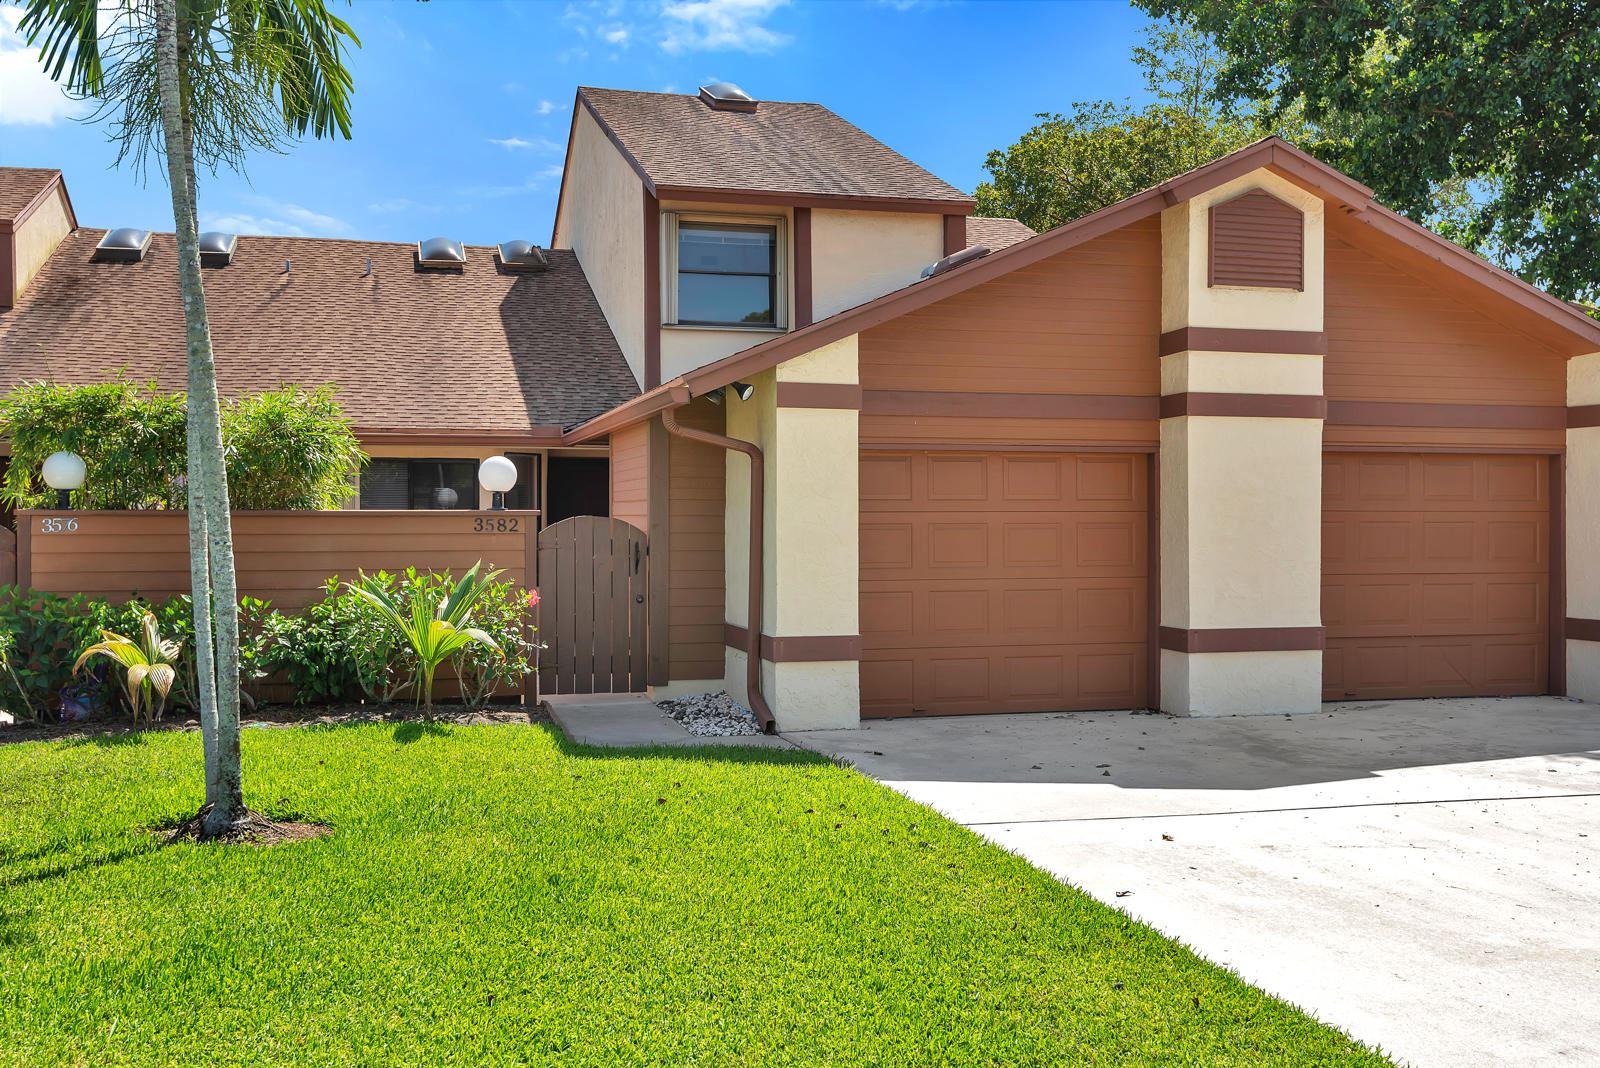 3582 Timberline Drive, West Palm Beach, FL 33406 - #: RX-10617817